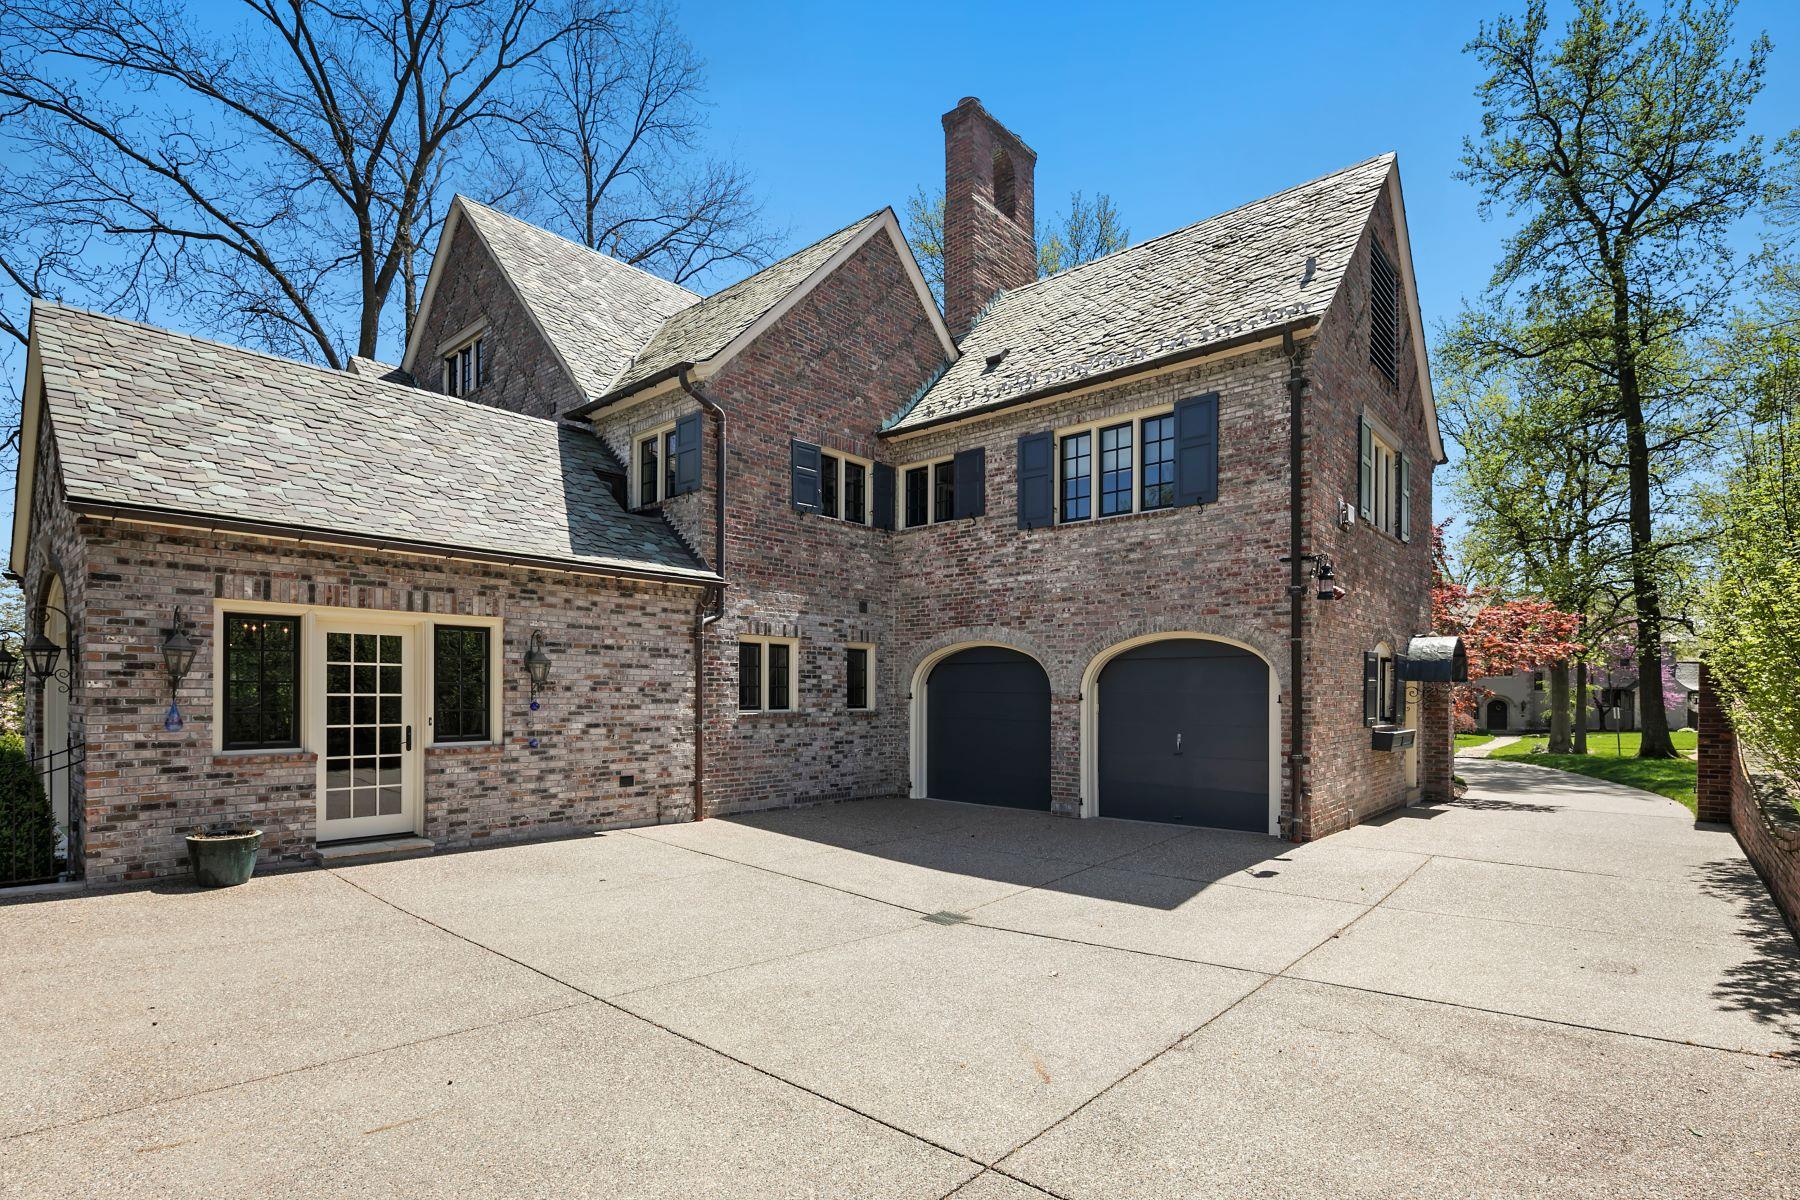 Additional photo for property listing at Spectacular Maritz and Young Designed Residence 6409 Ellenwood Avenue Clayton, Missouri 63105 United States